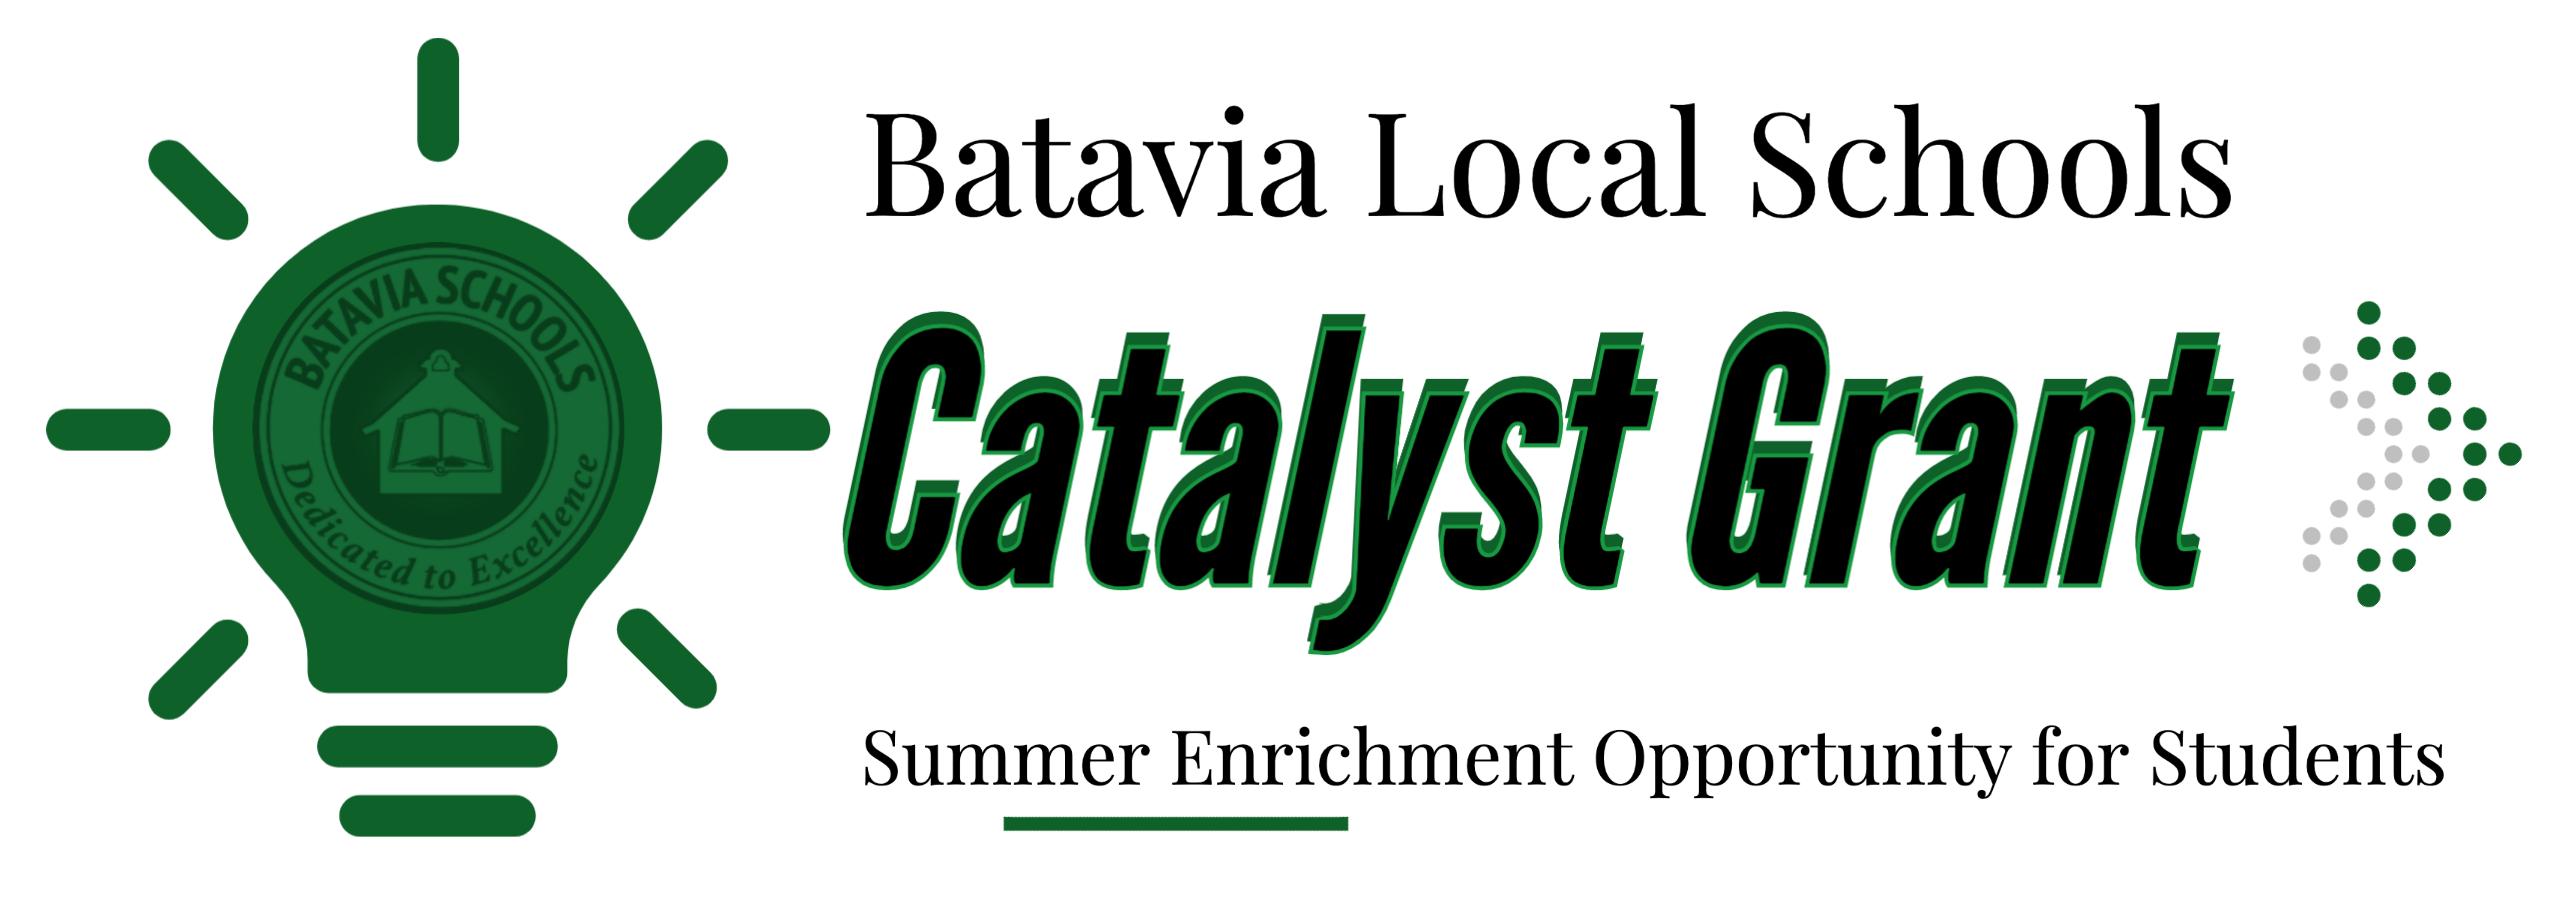 batavia schools catayst grant graphic